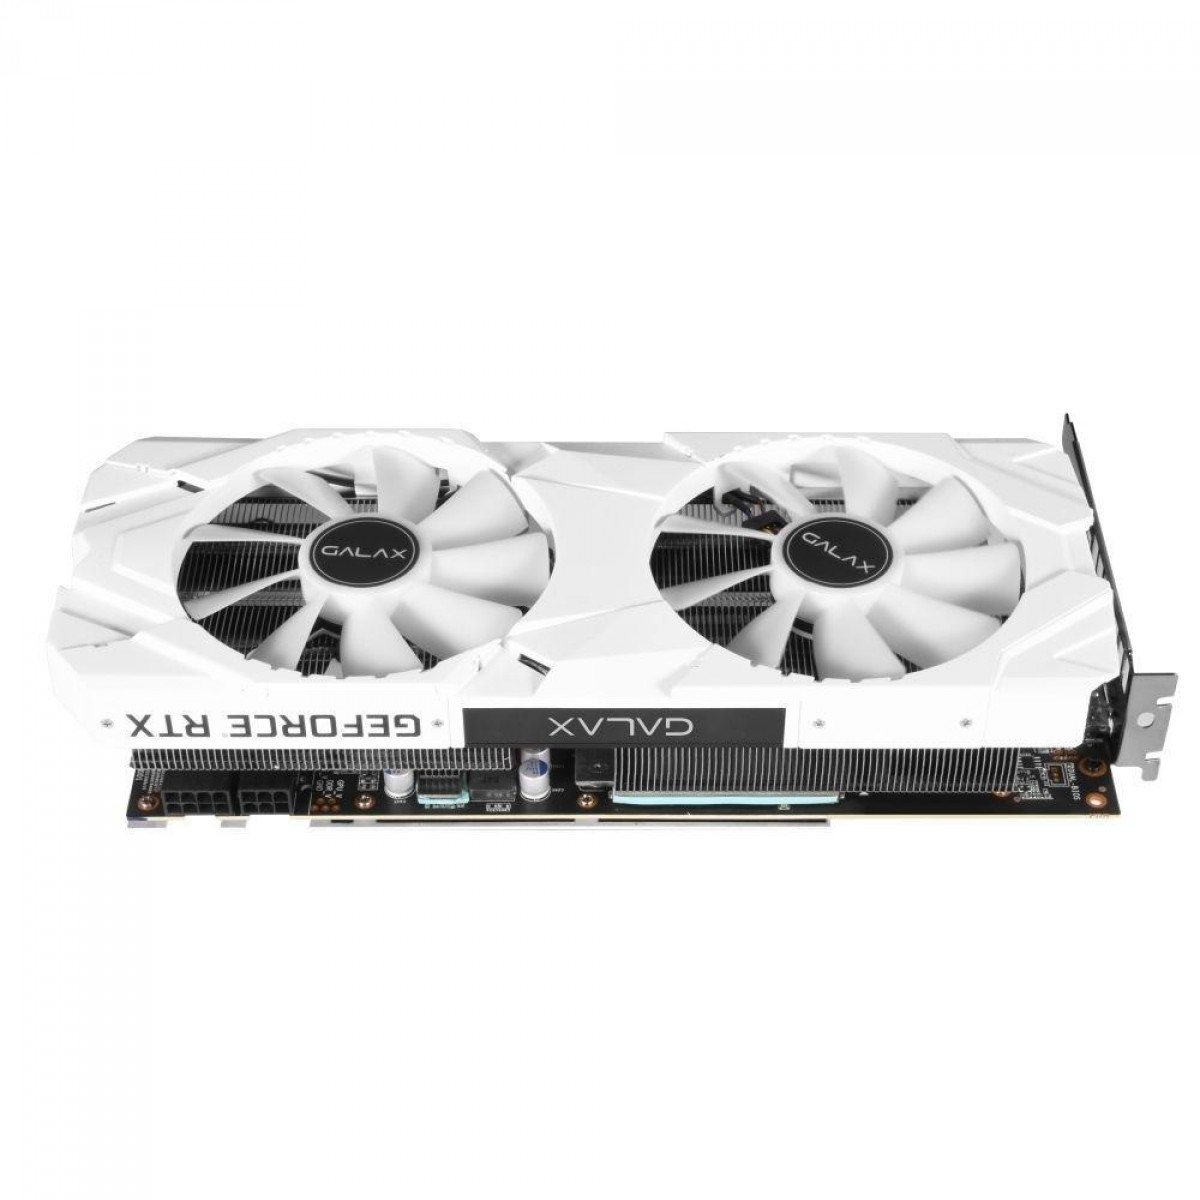 Placa de Vídeo Galax, Geforce RTX 2060 Plus Ex White Dual (1-Click OC), 6GB, GDDR6, 192Bit, 26NRL7MPX6AZ